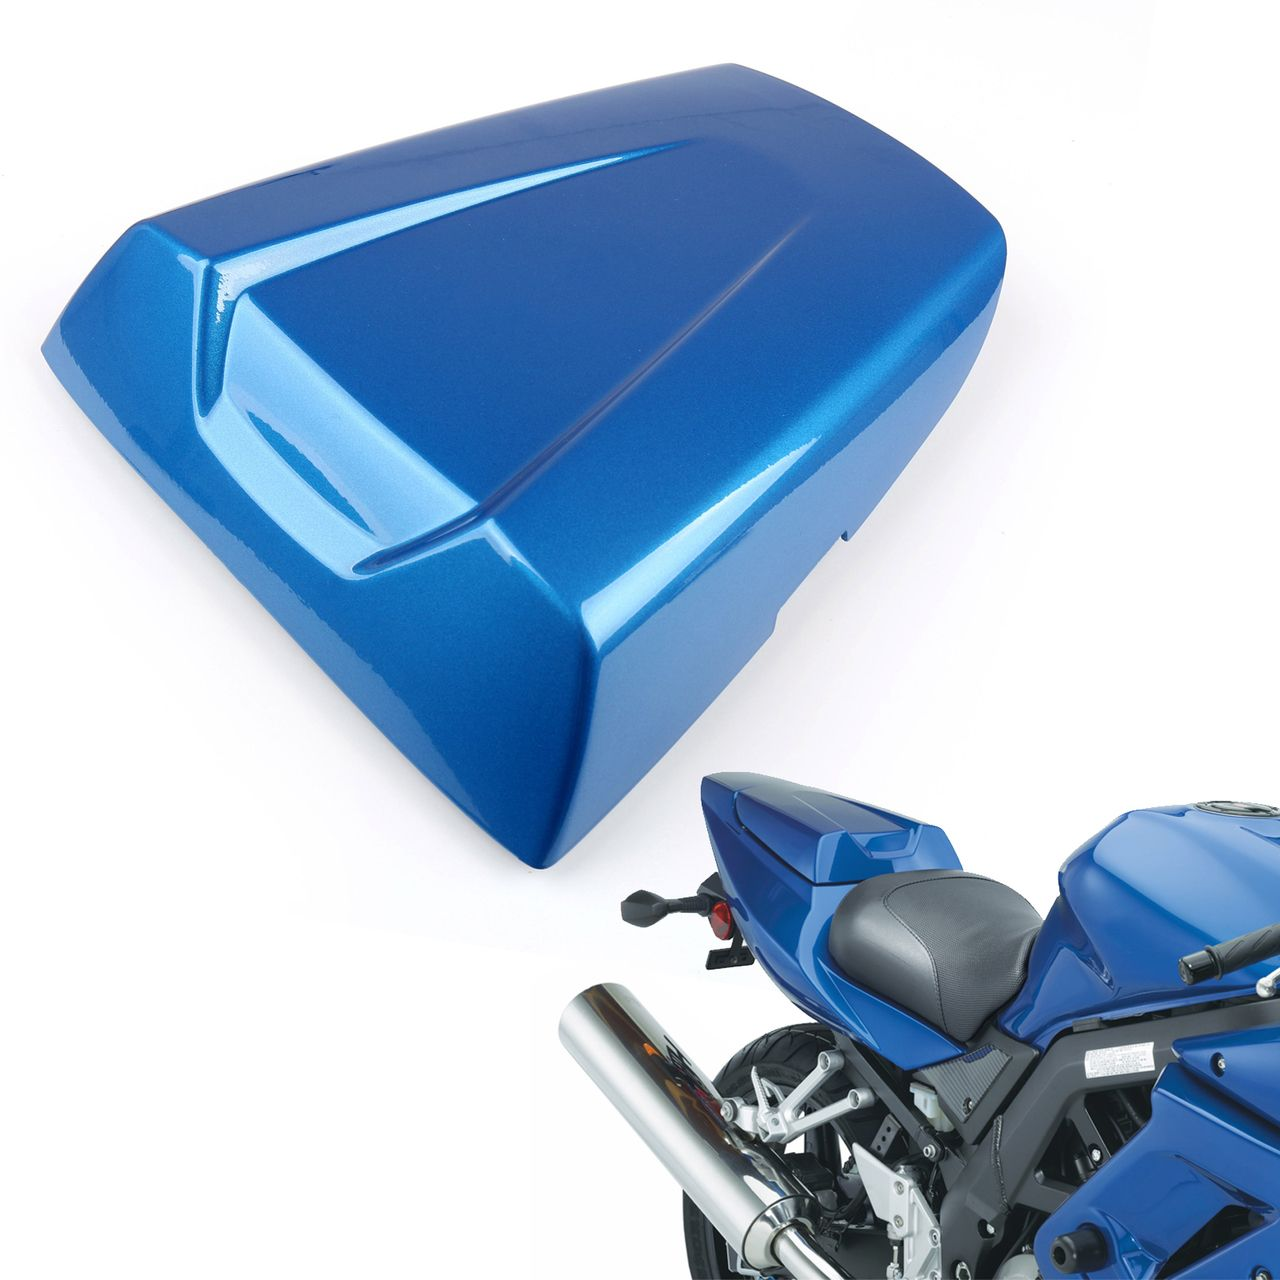 medium resolution of mad hornets rear passenger seat cover cowl suzuki sv650 sv1000 2003 2010 2004 2005